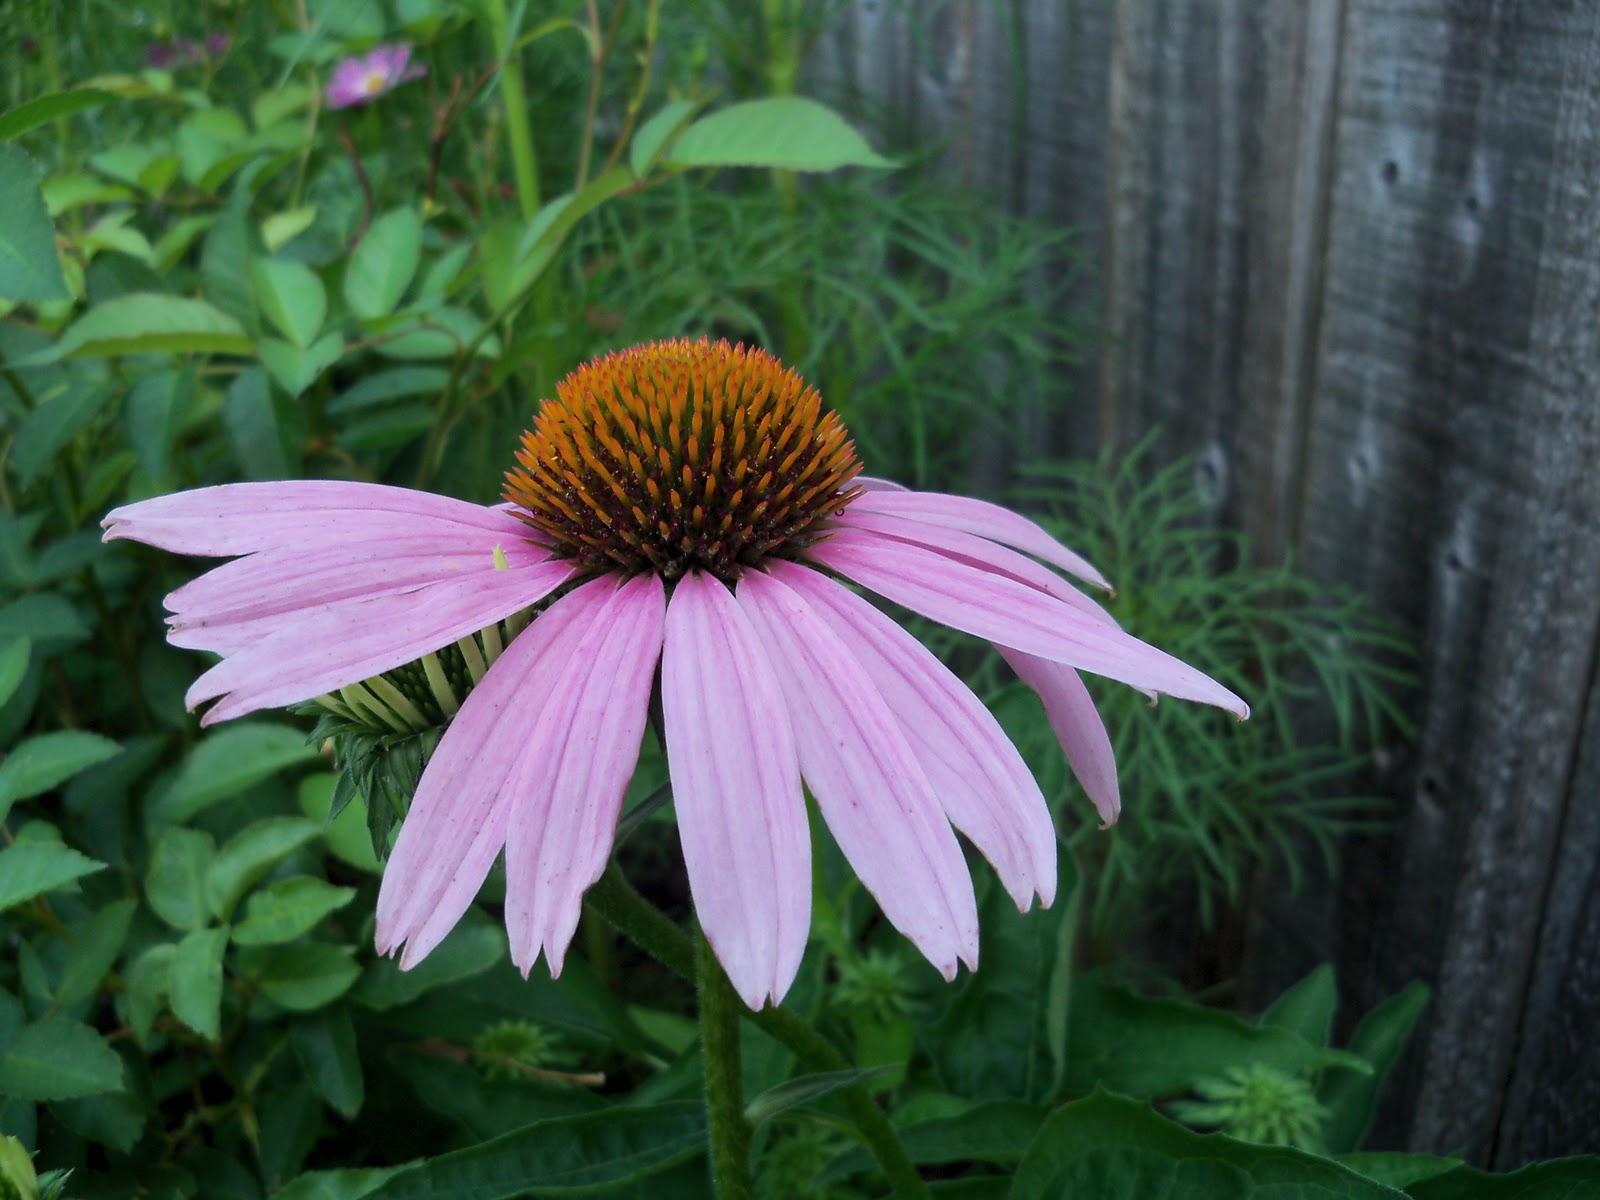 Gardening 2010, Part Two - 101_3263.JPG